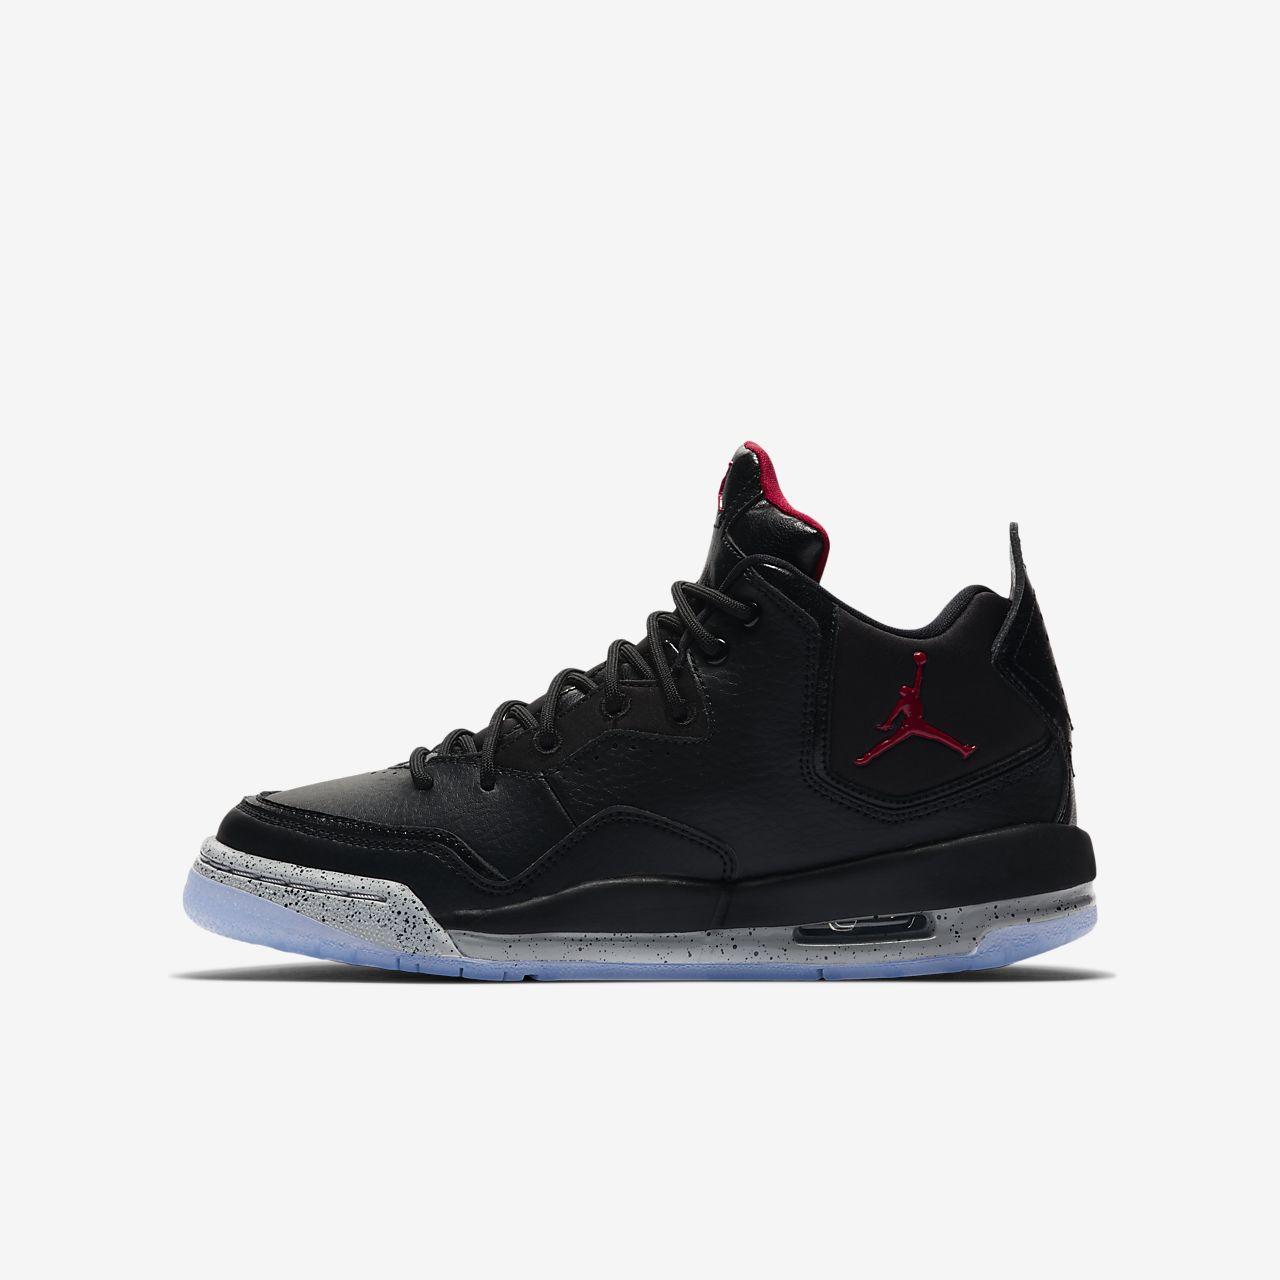 Jordan 23 Chaussures Courtside Blanc 7XuxM